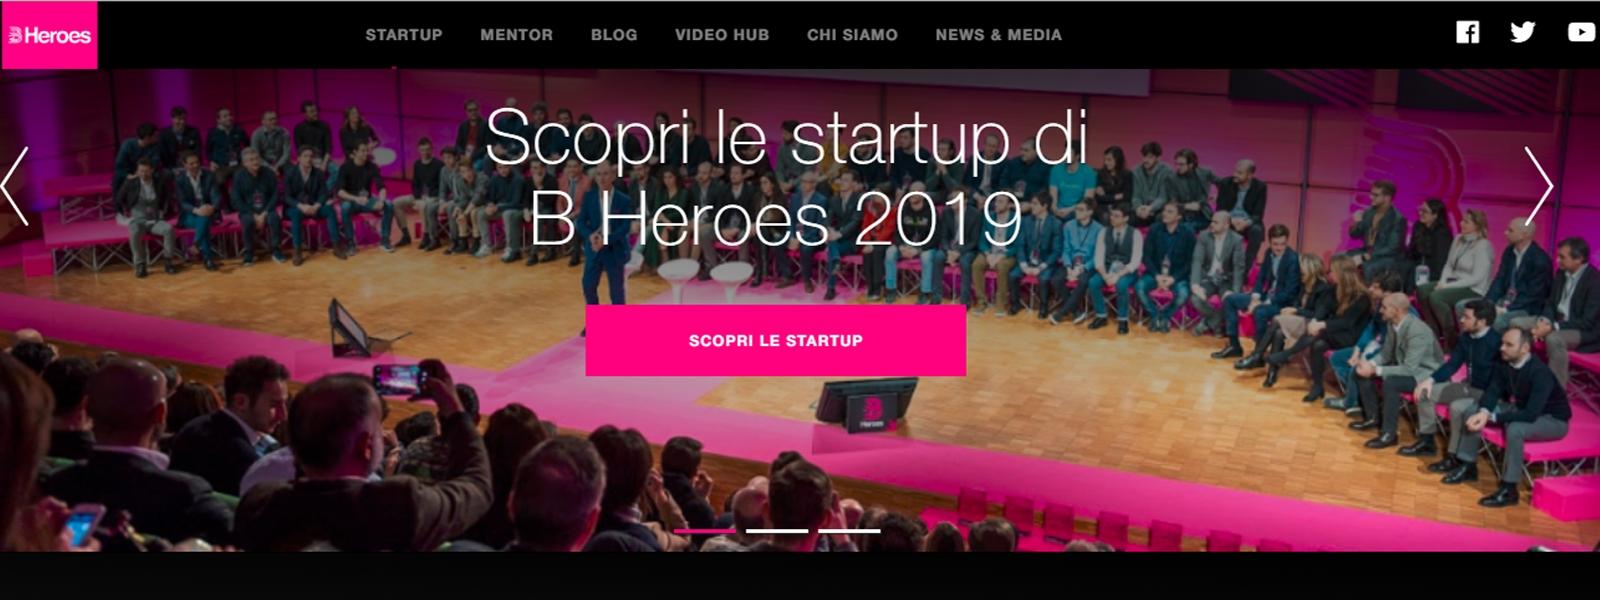 B Heroes Vidiemme azienda consulenza tecnologica